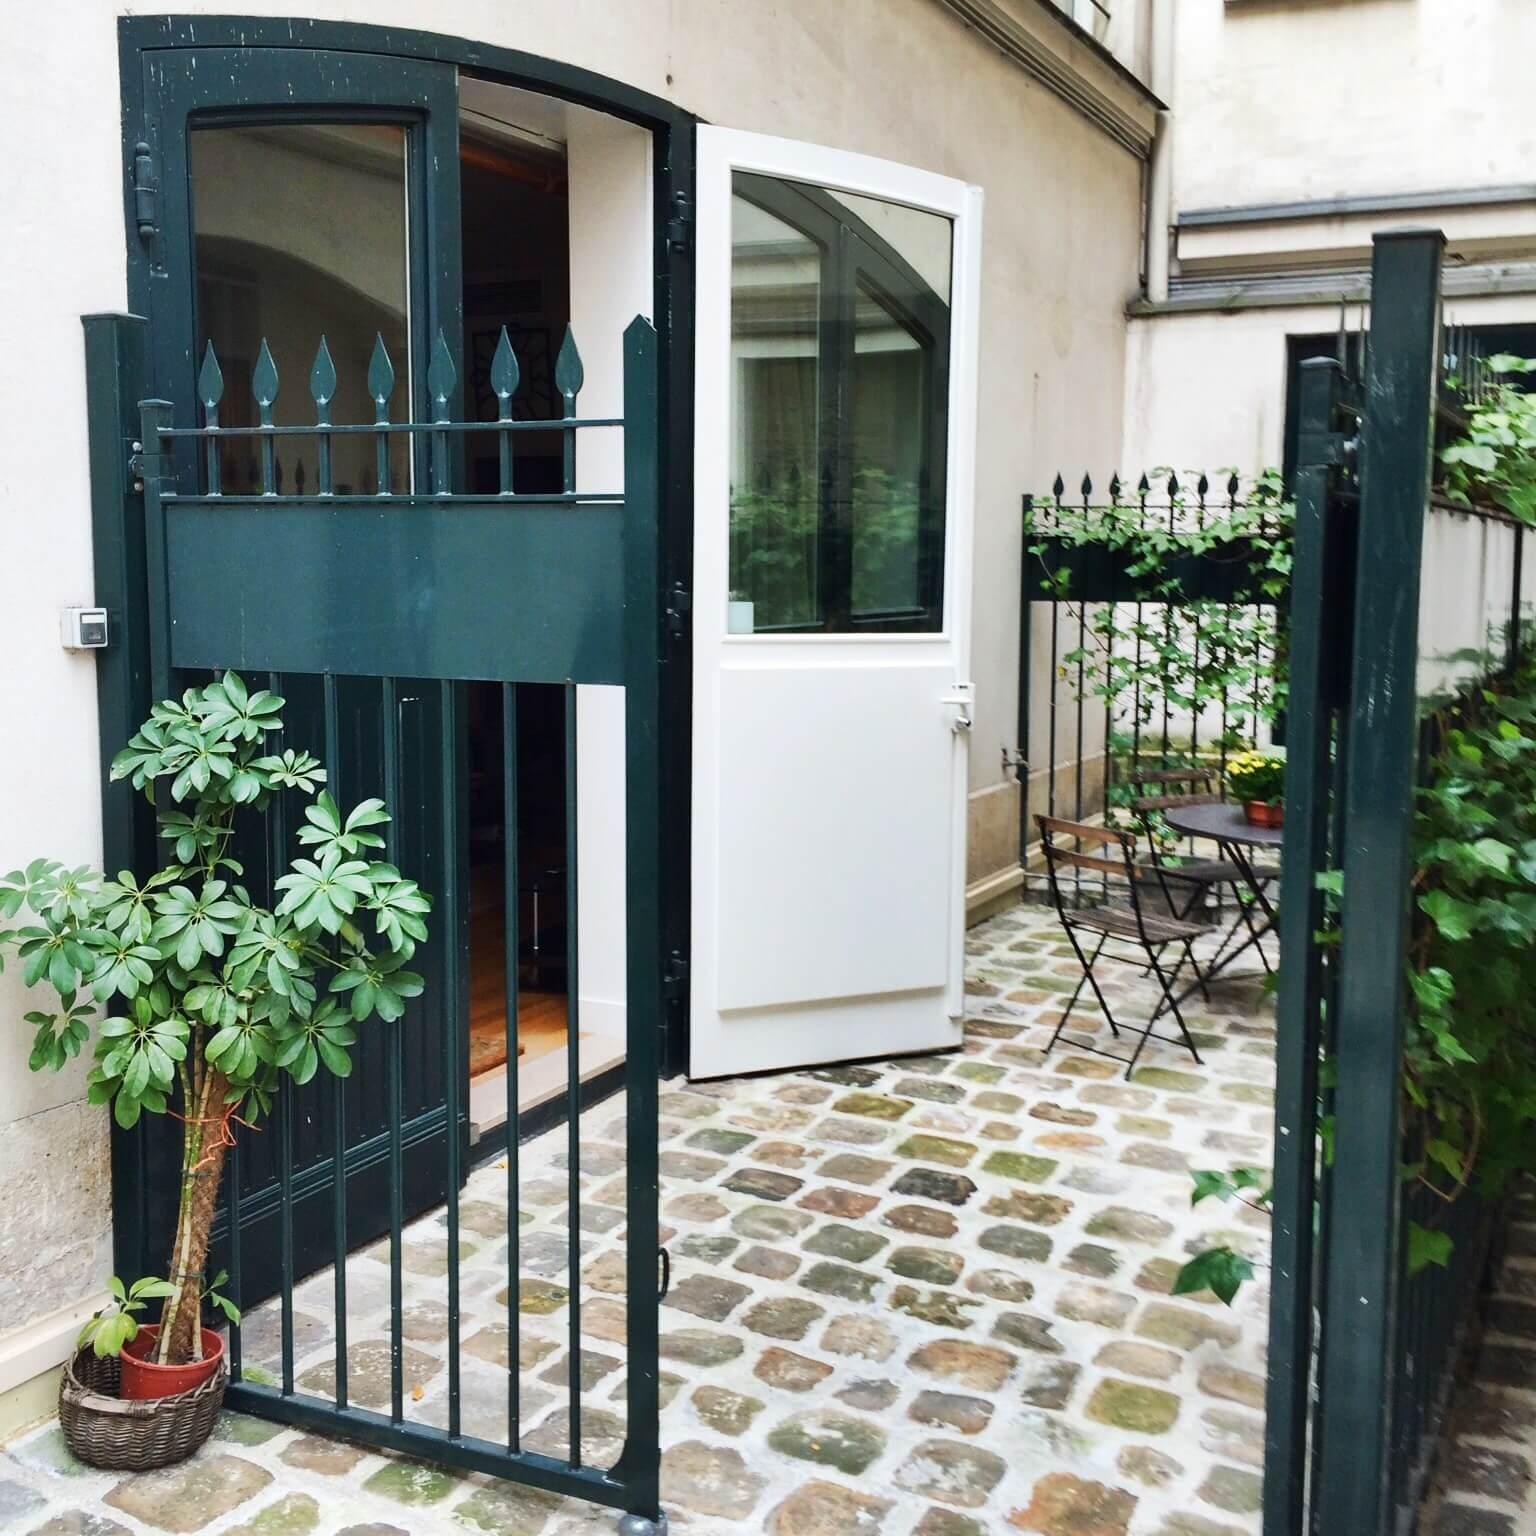 Apartment in Paris courtyard